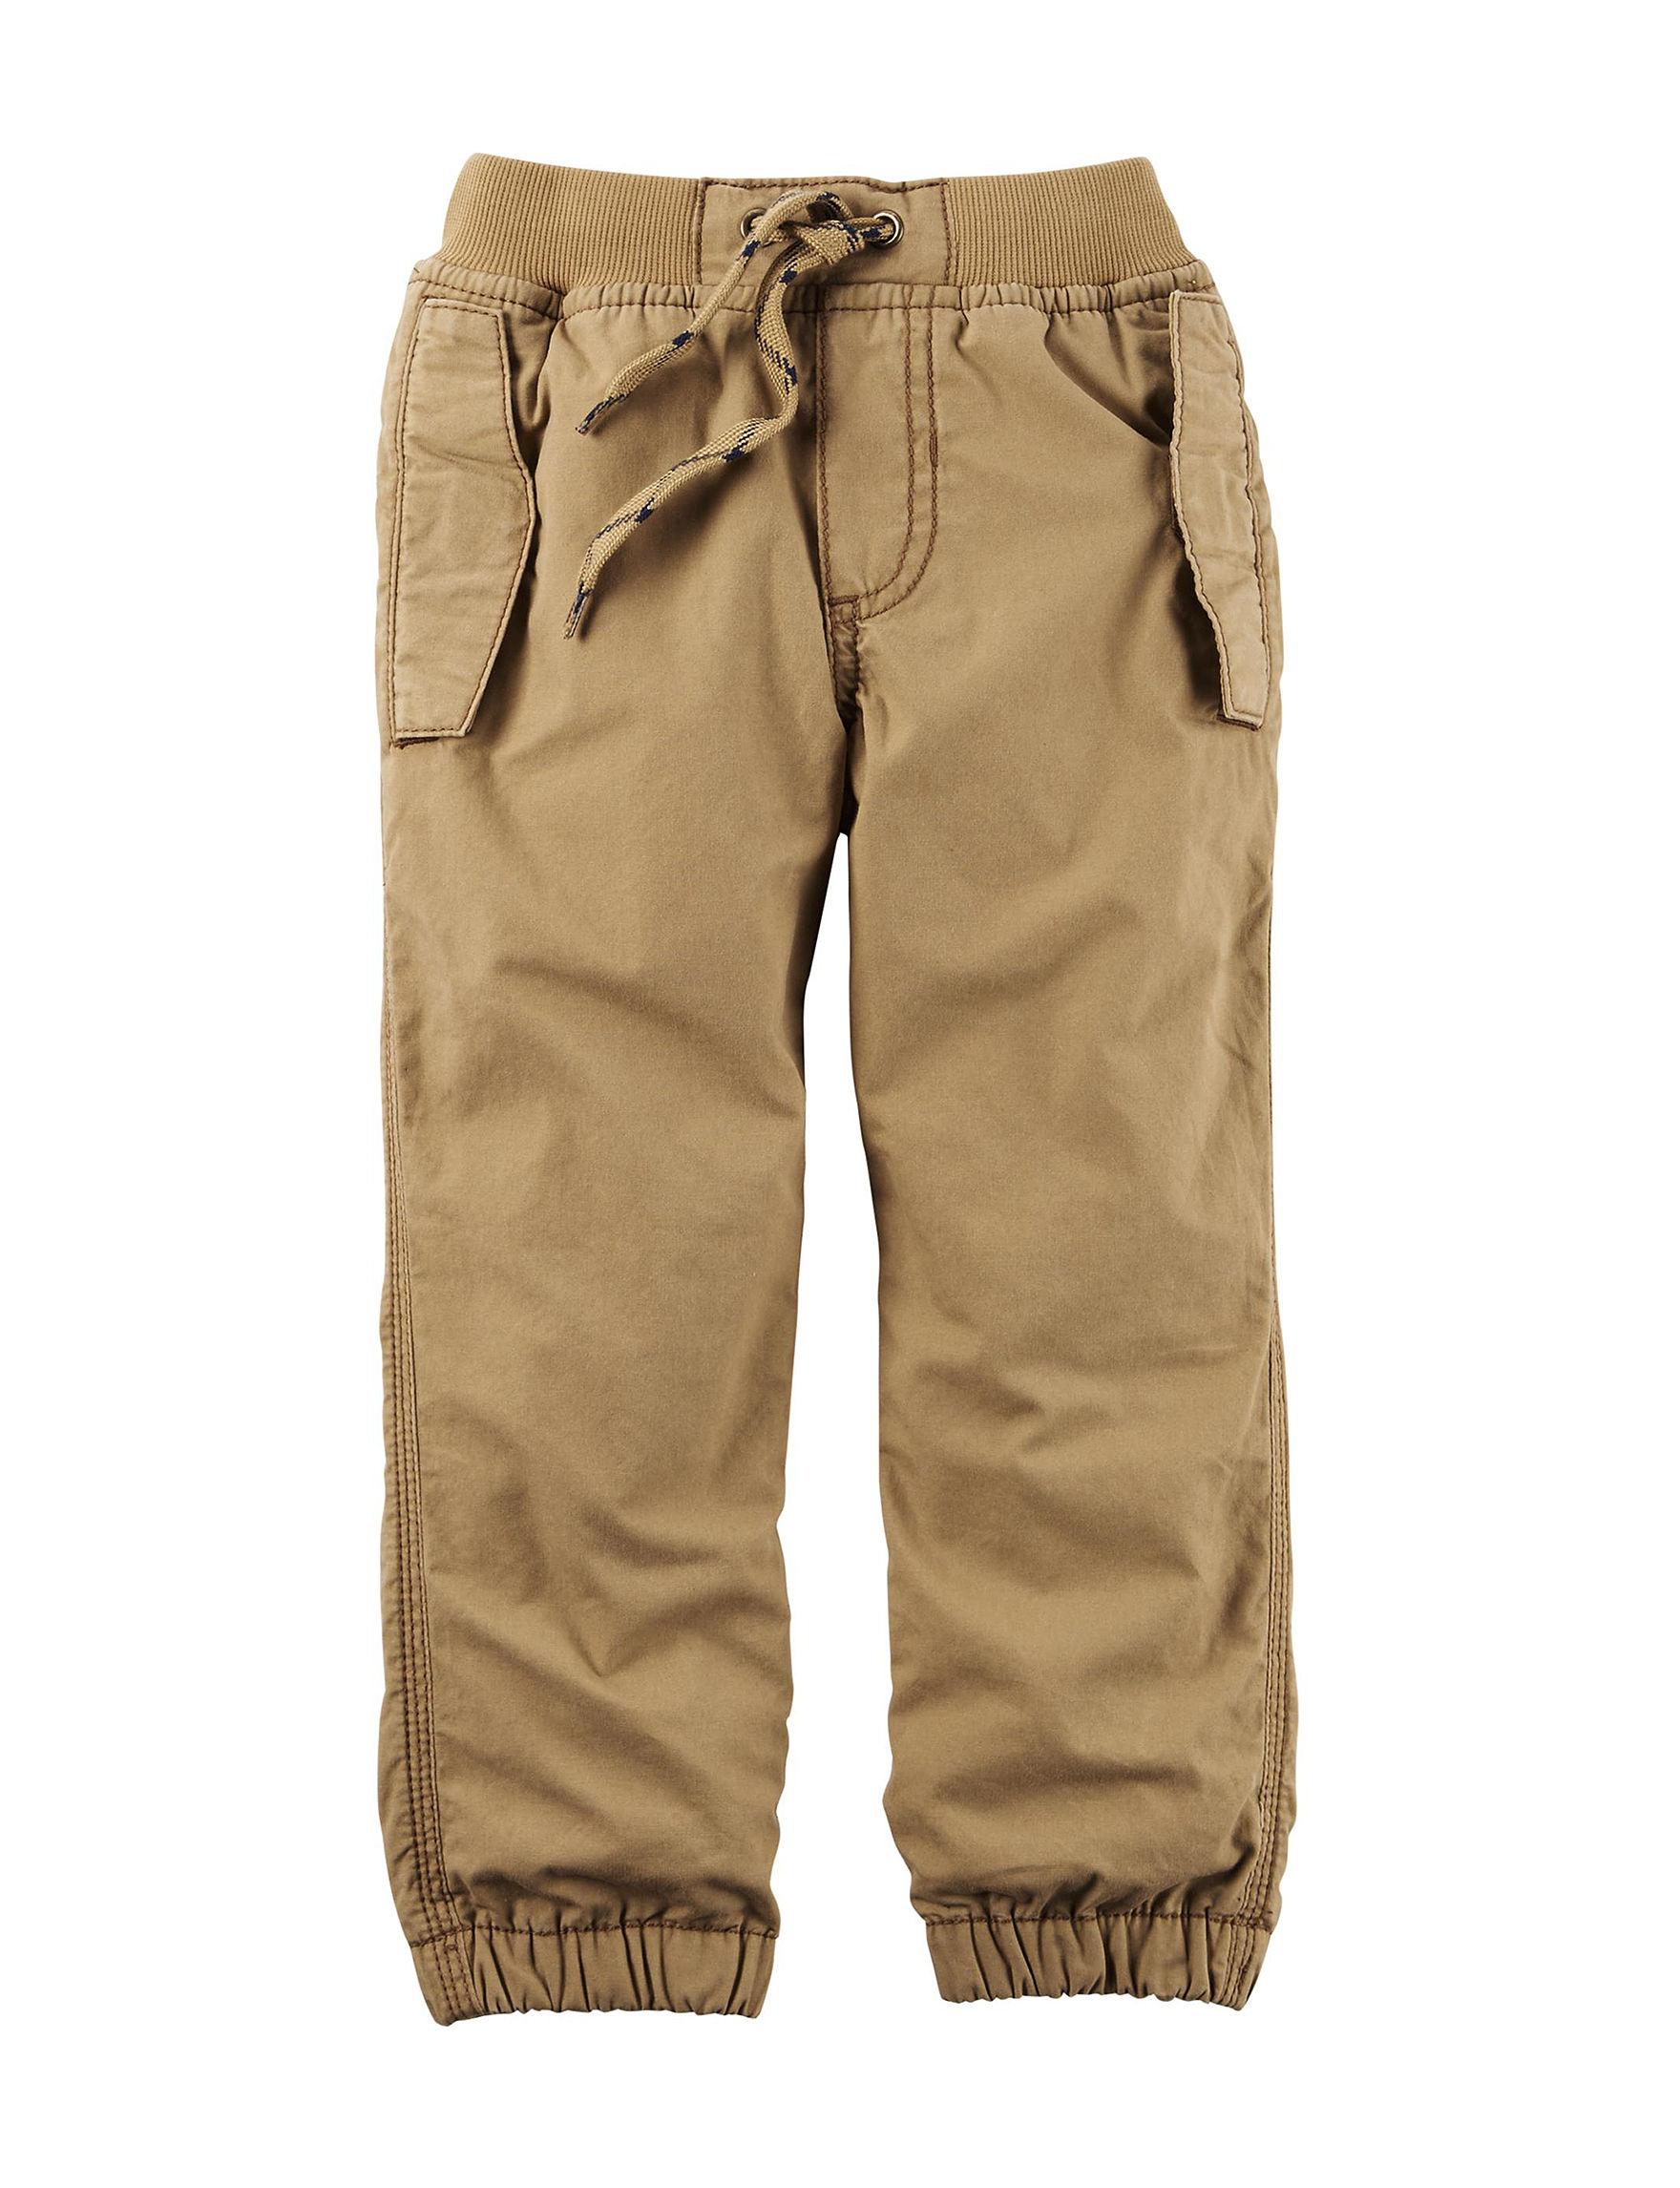 Carter's Khaki Fleece & Soft Shell Jackets